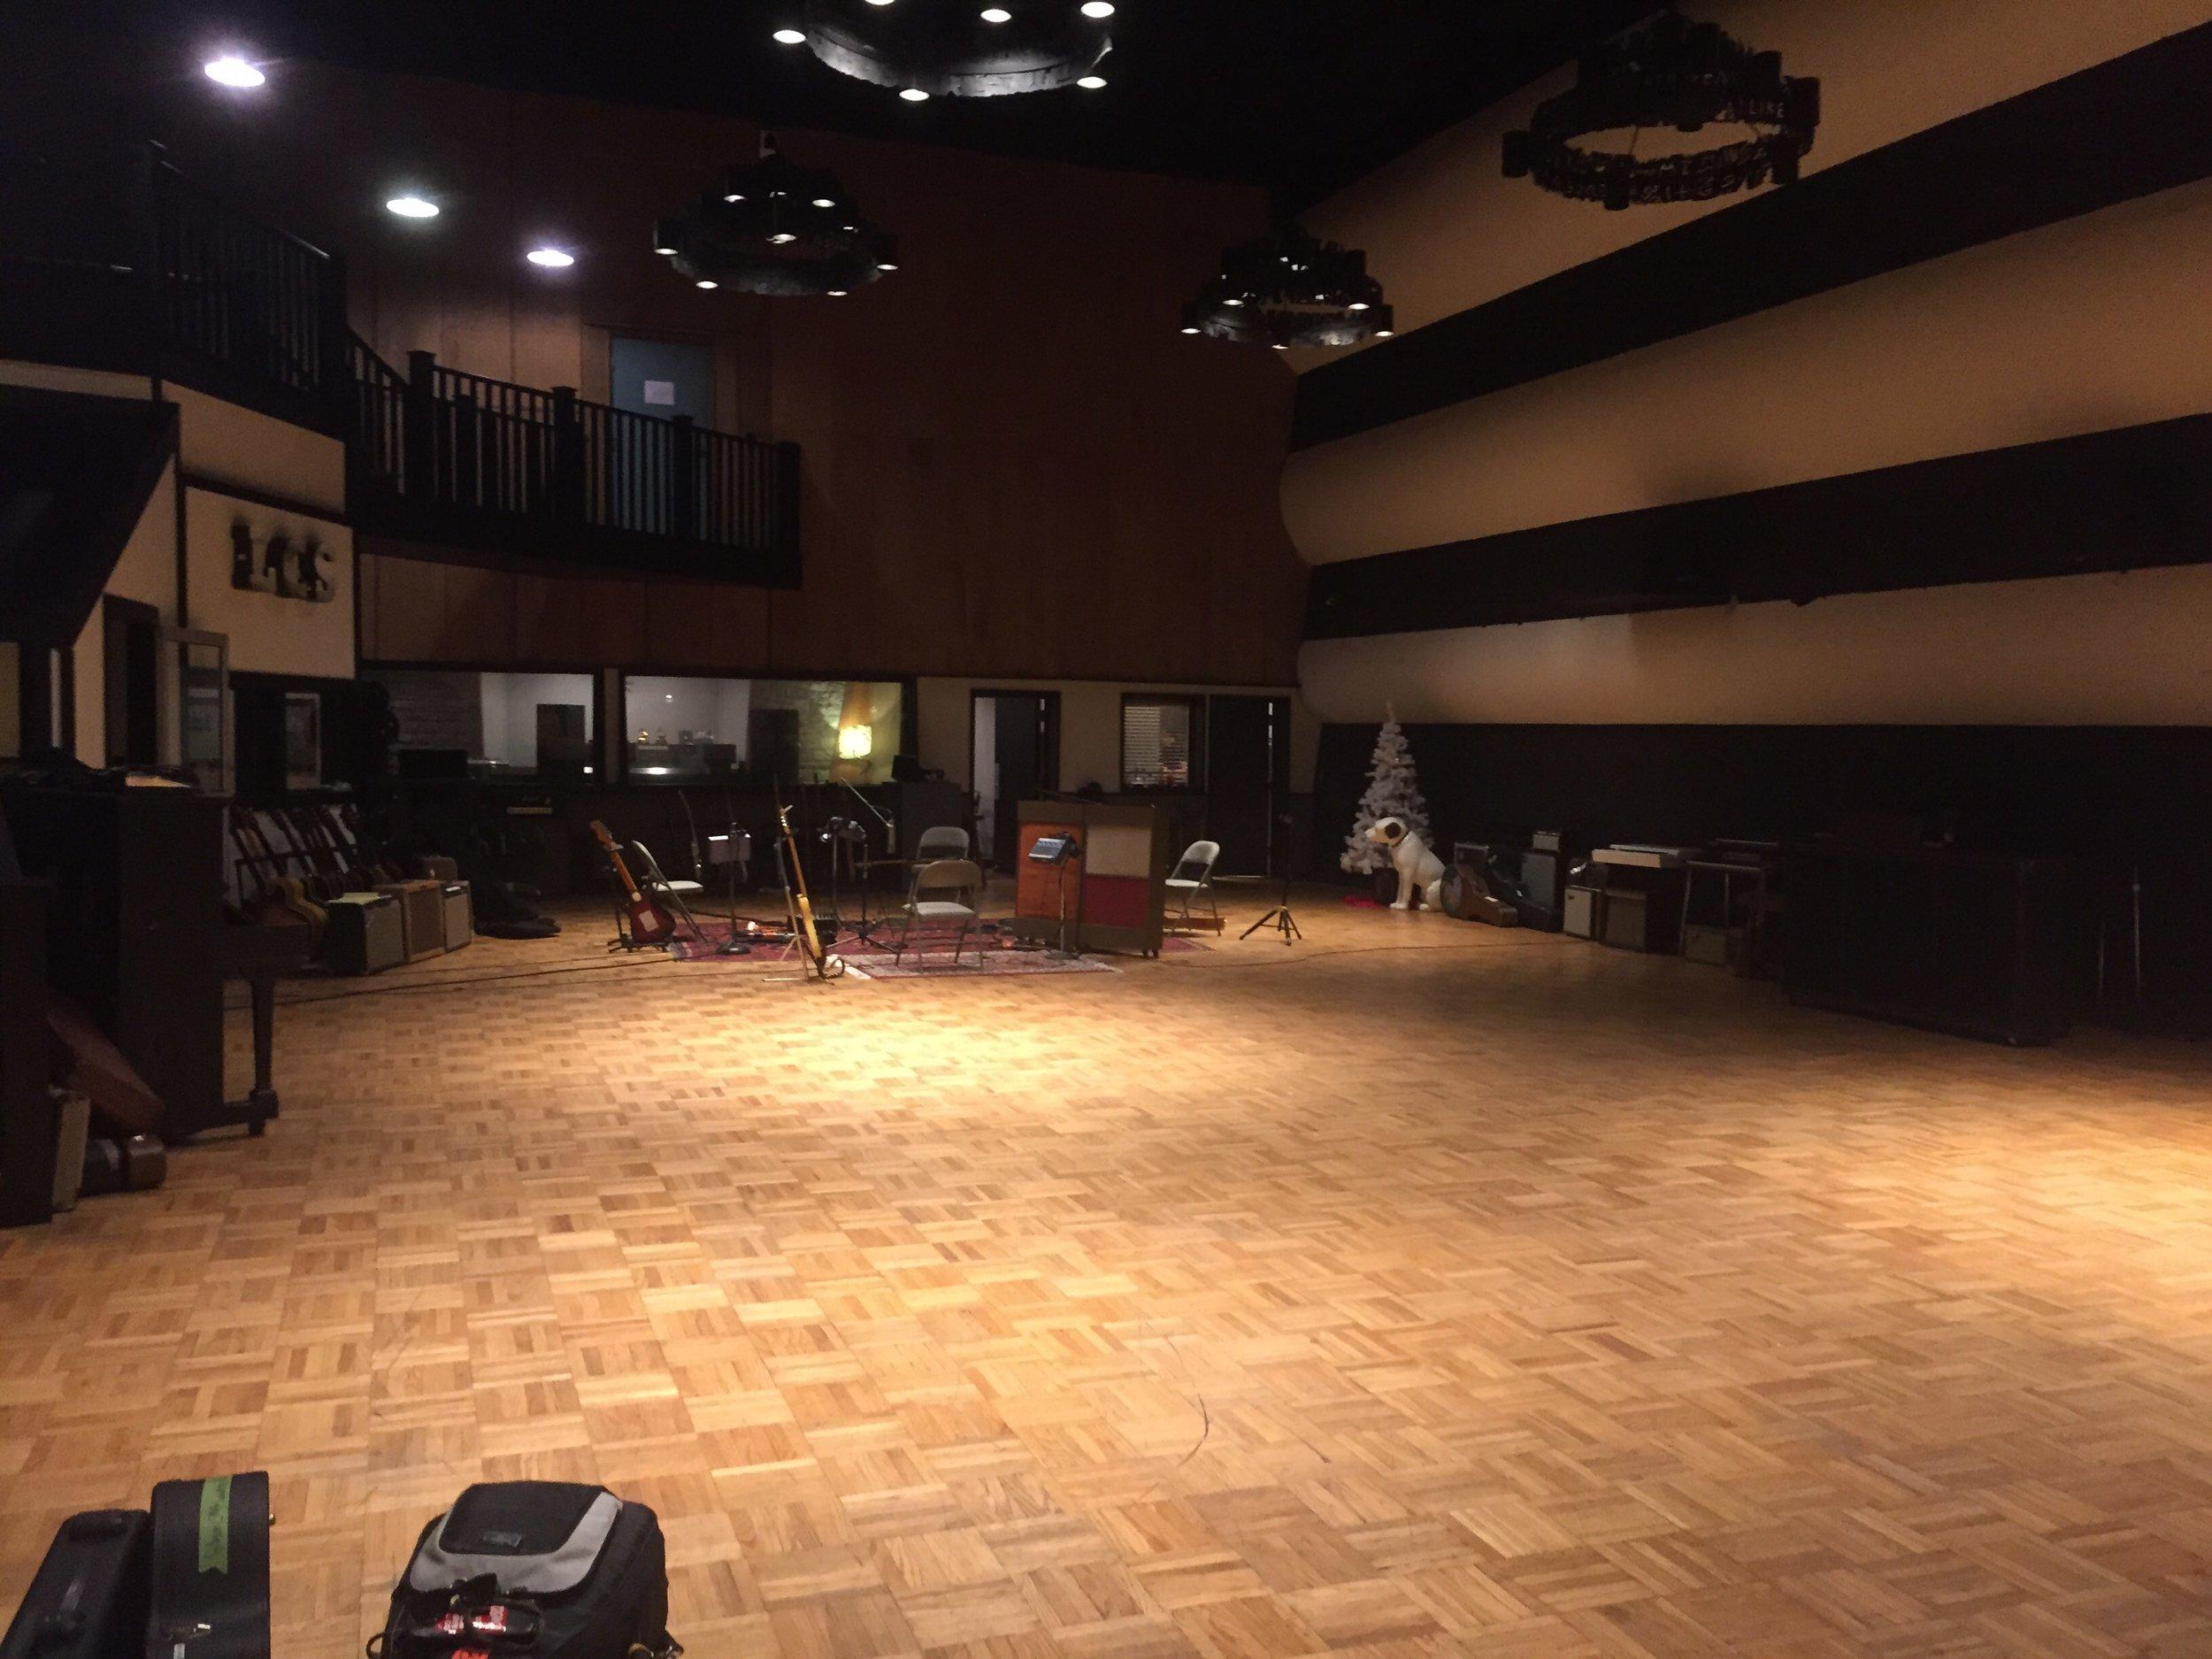 RCA_Studio_A_Main_Sound_Room.jpeg